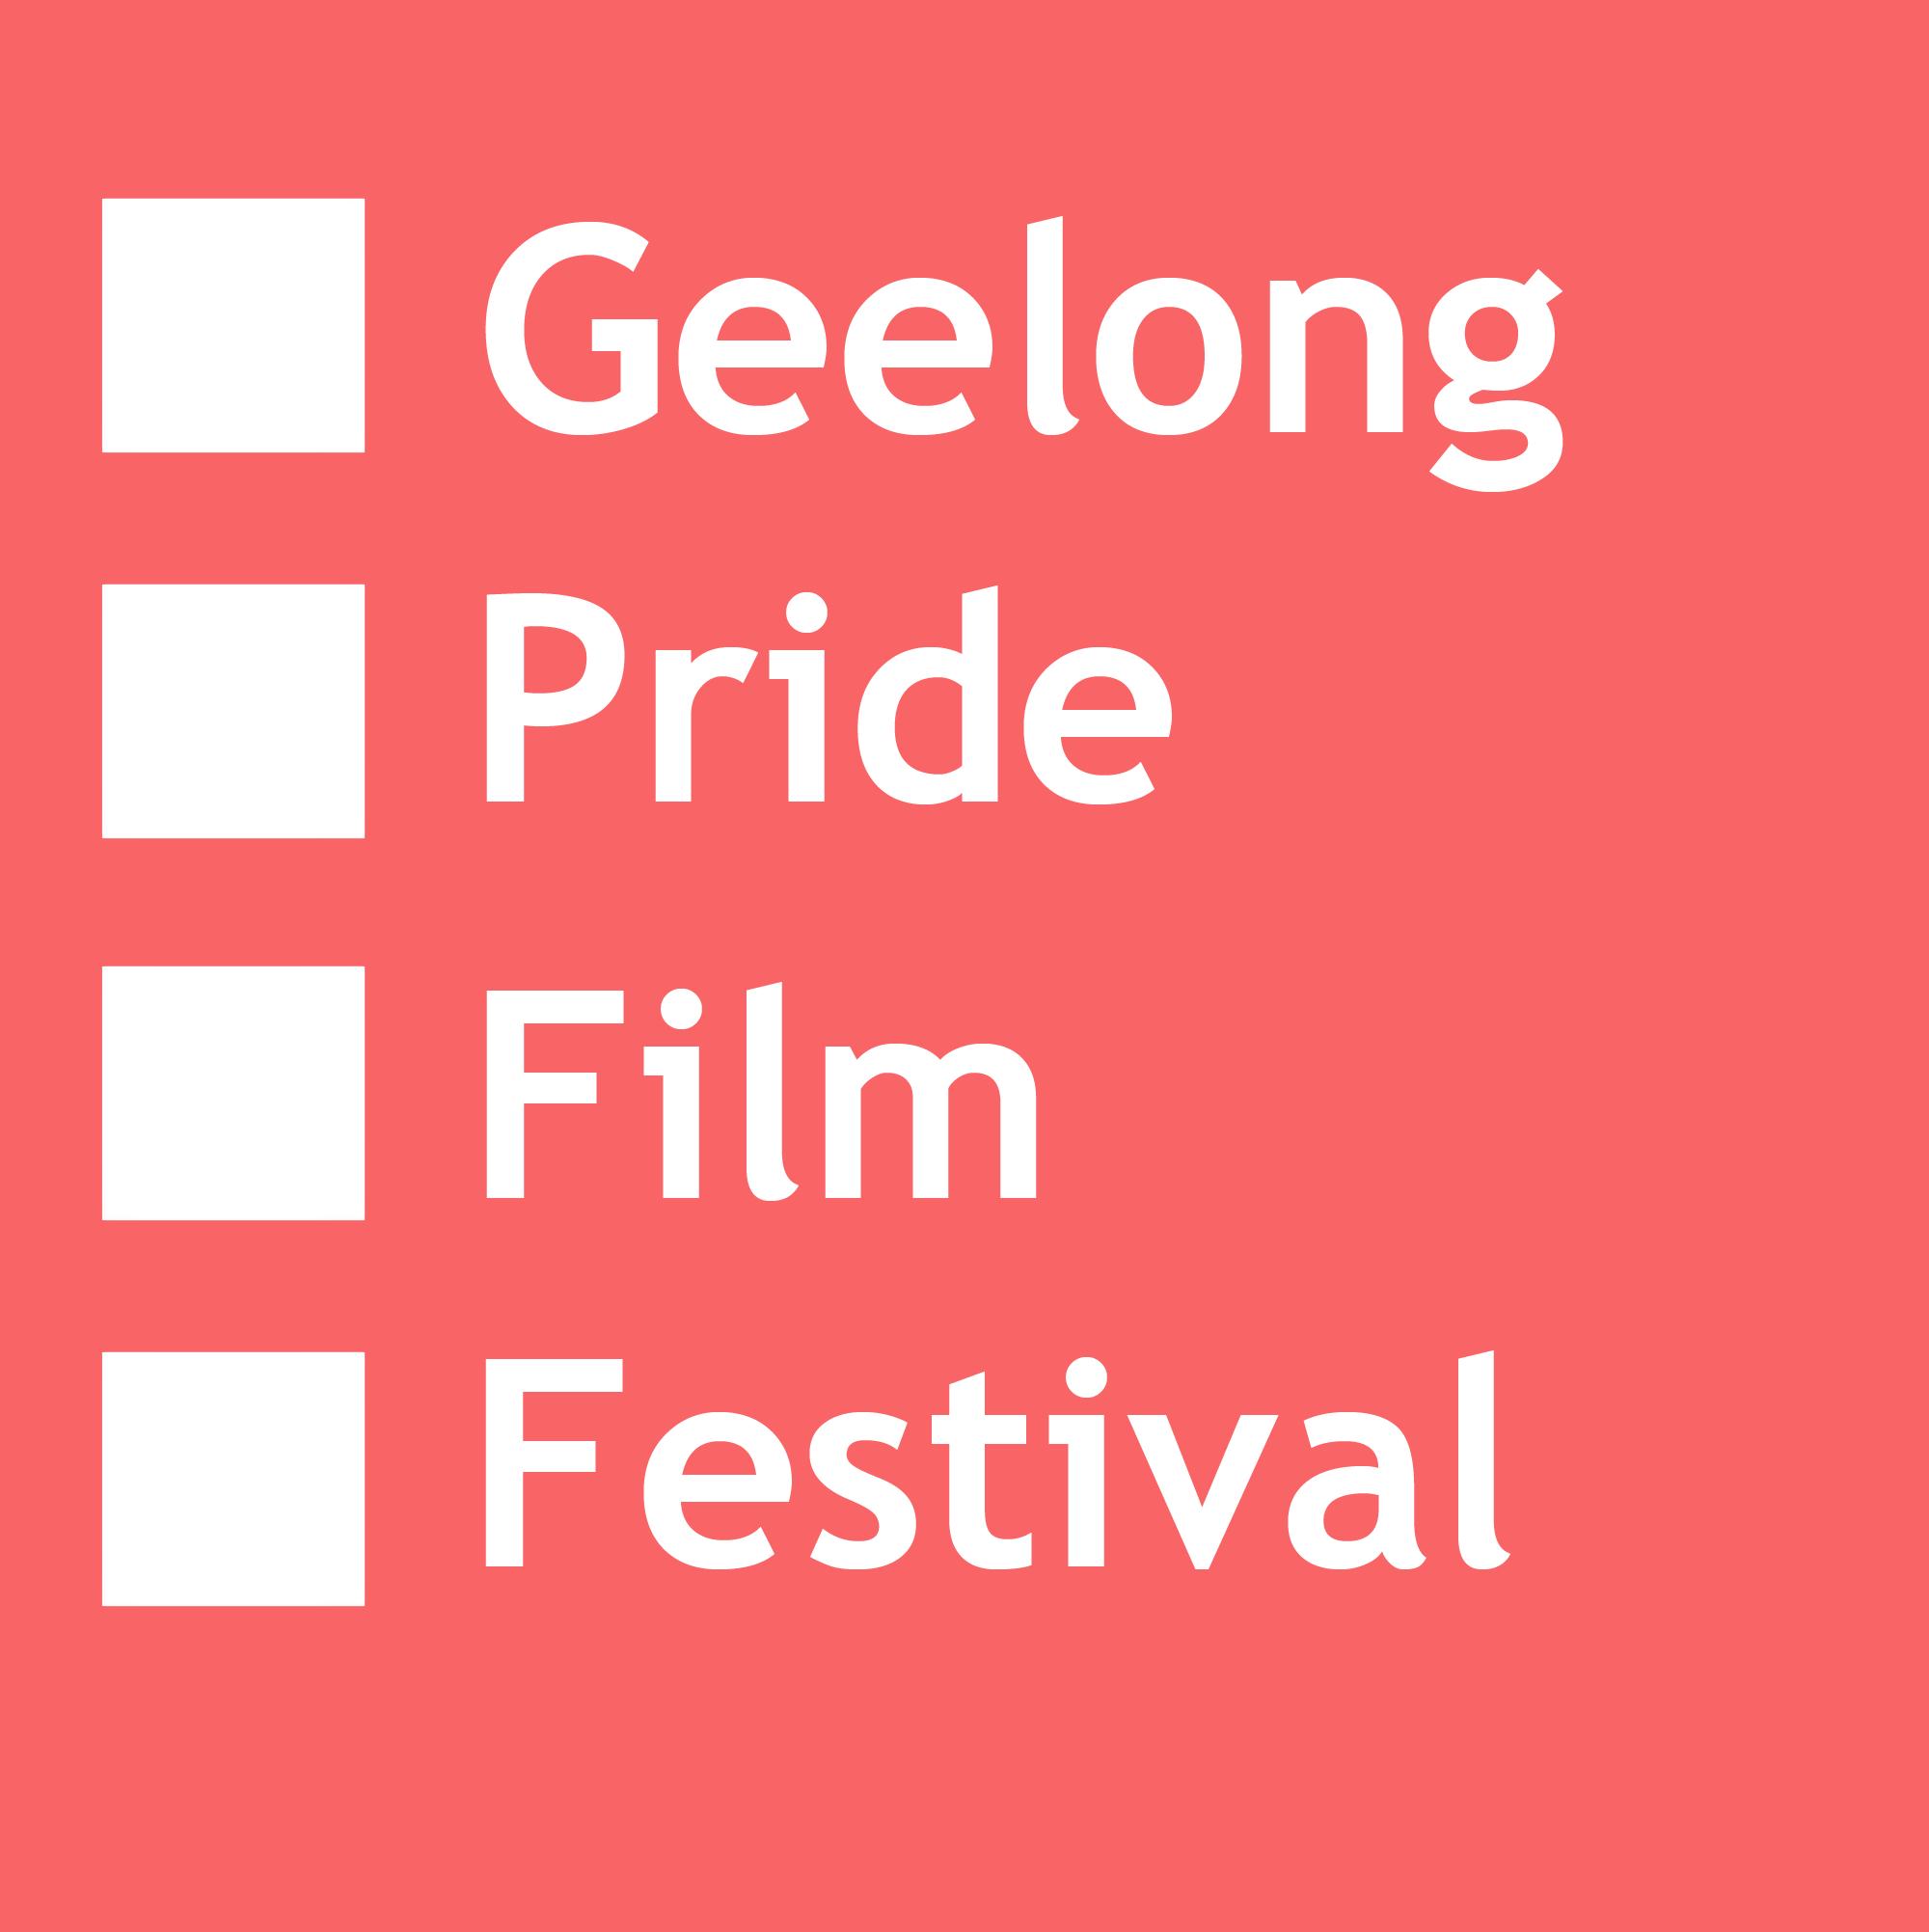 Geelong Pride film festival Logo